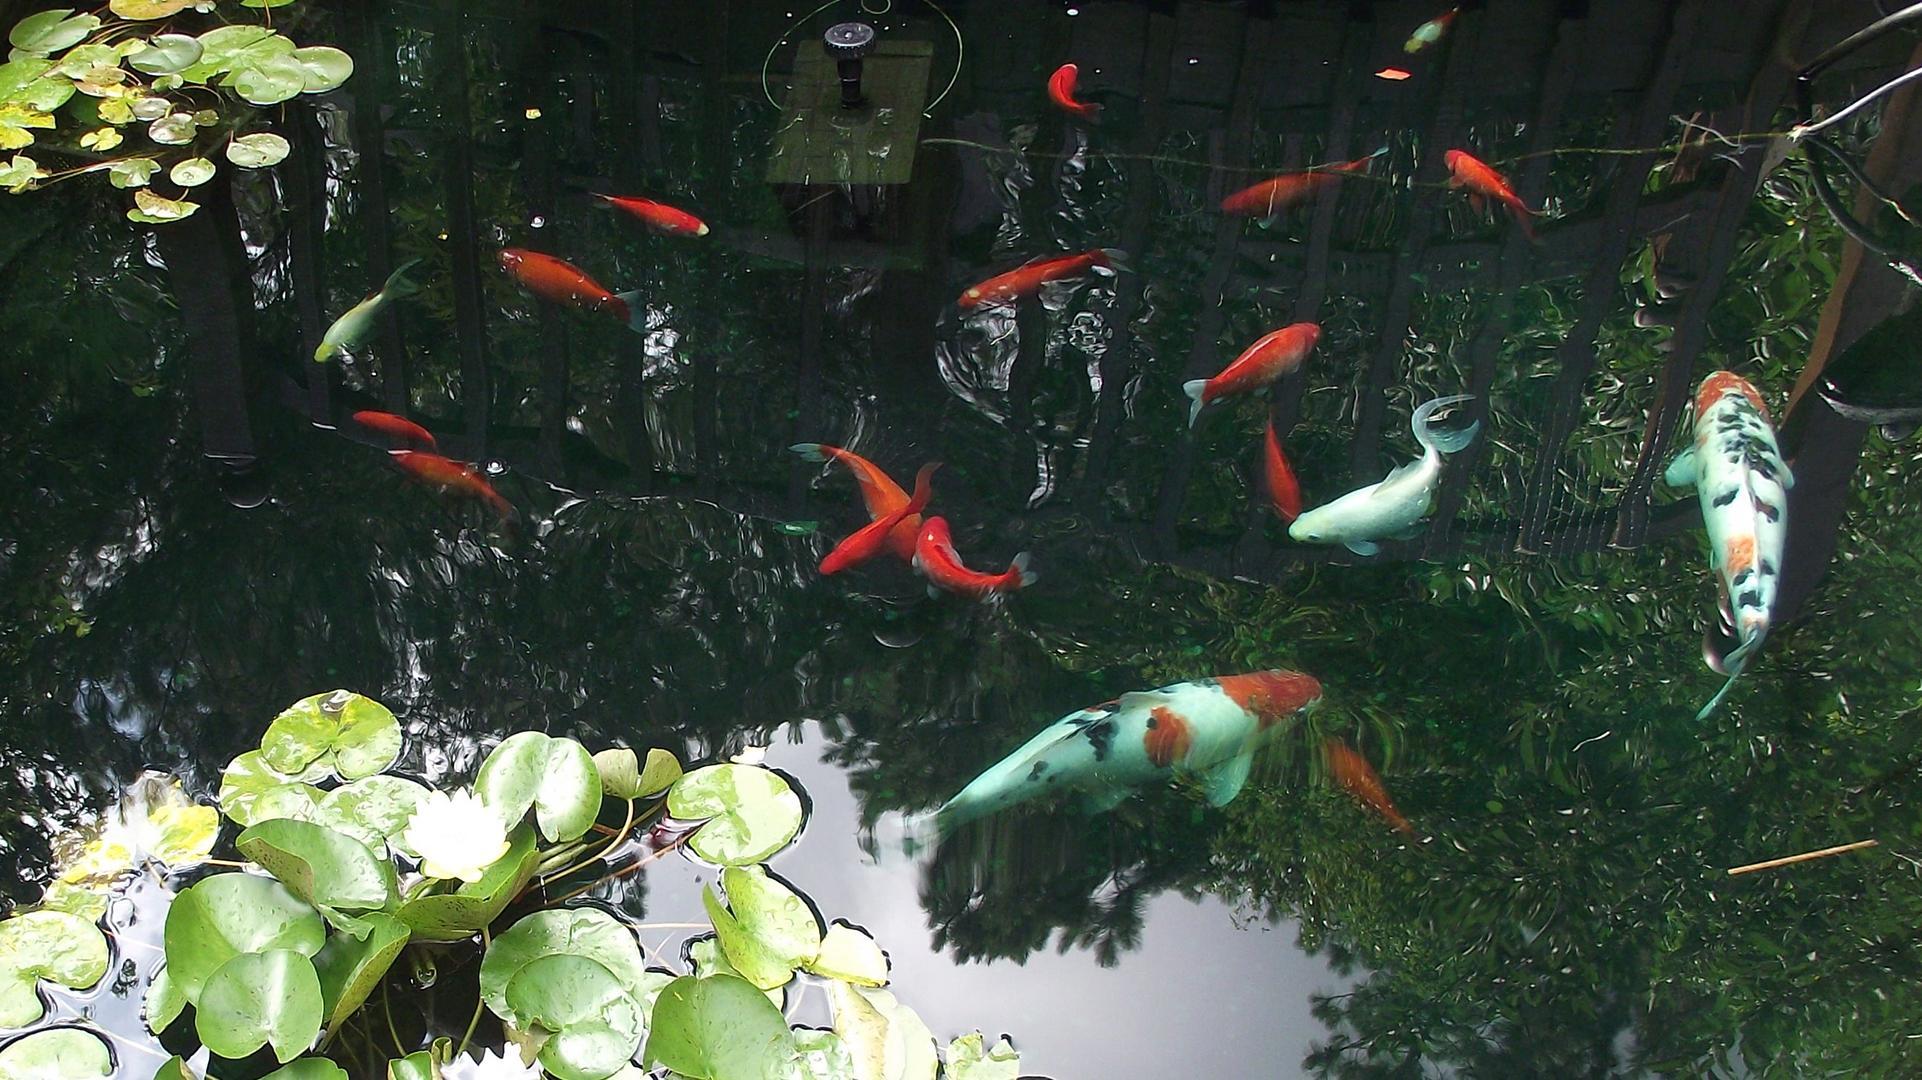 Koi Fish Pond Wallpaper Hd - Fish Pond , HD Wallpaper & Backgrounds